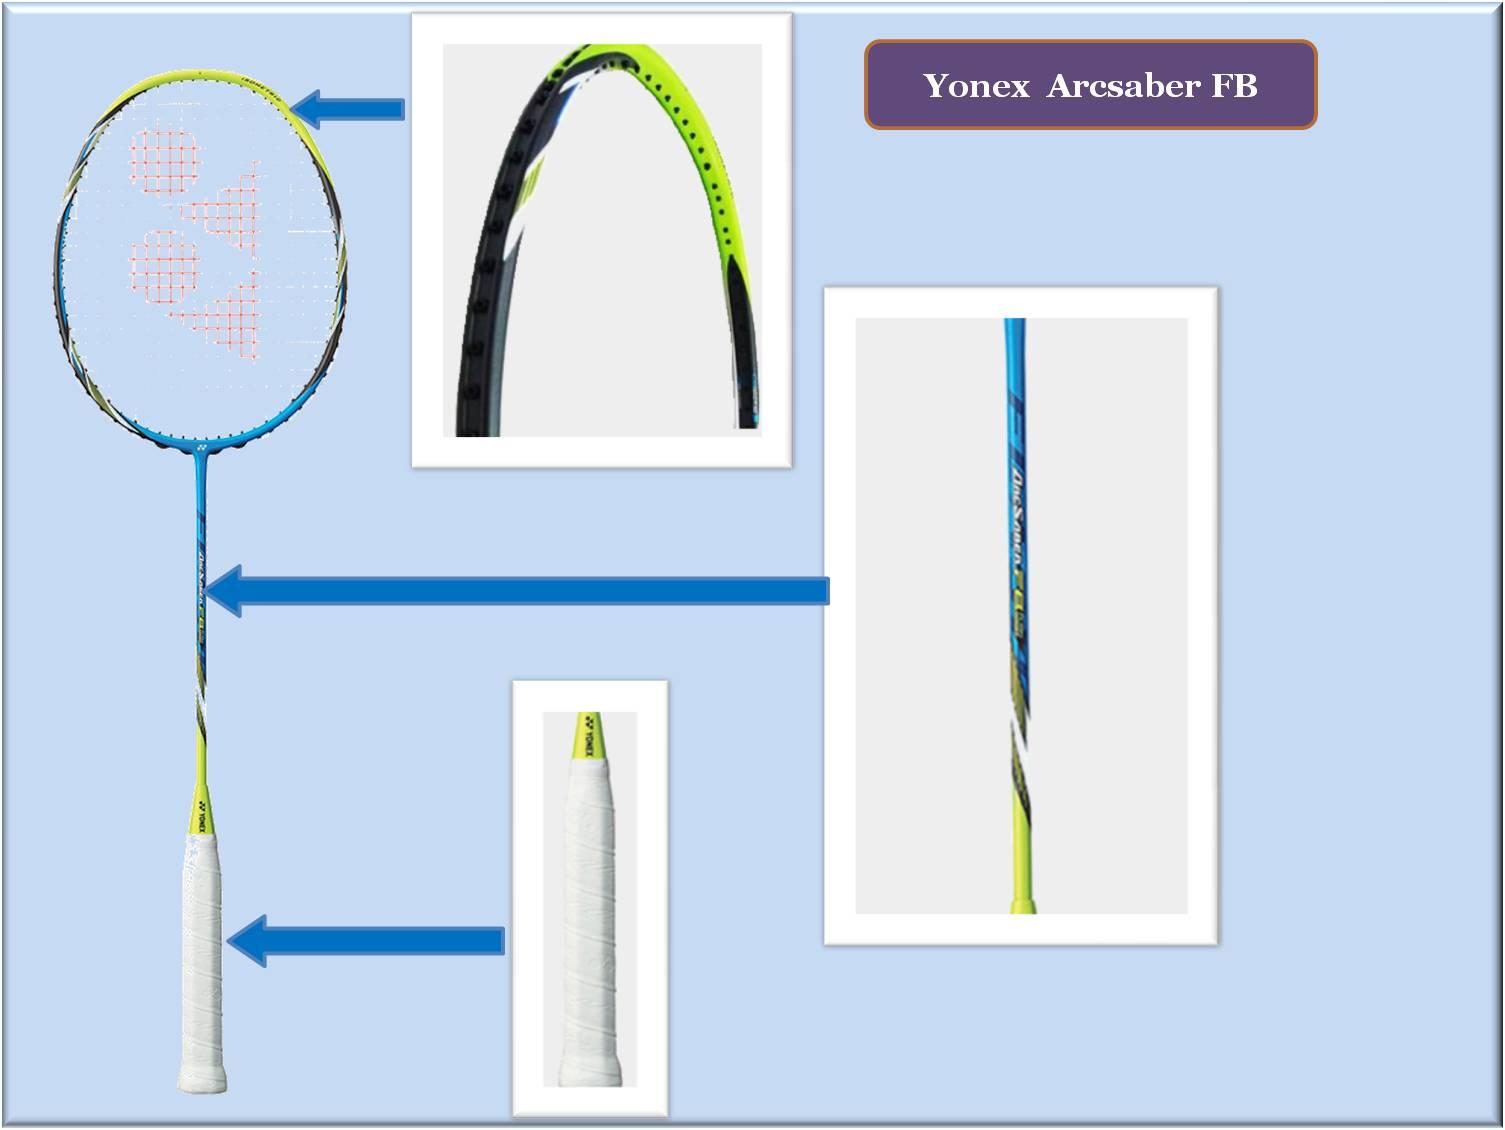 Yonex arcsaber FB Badminton Racket images